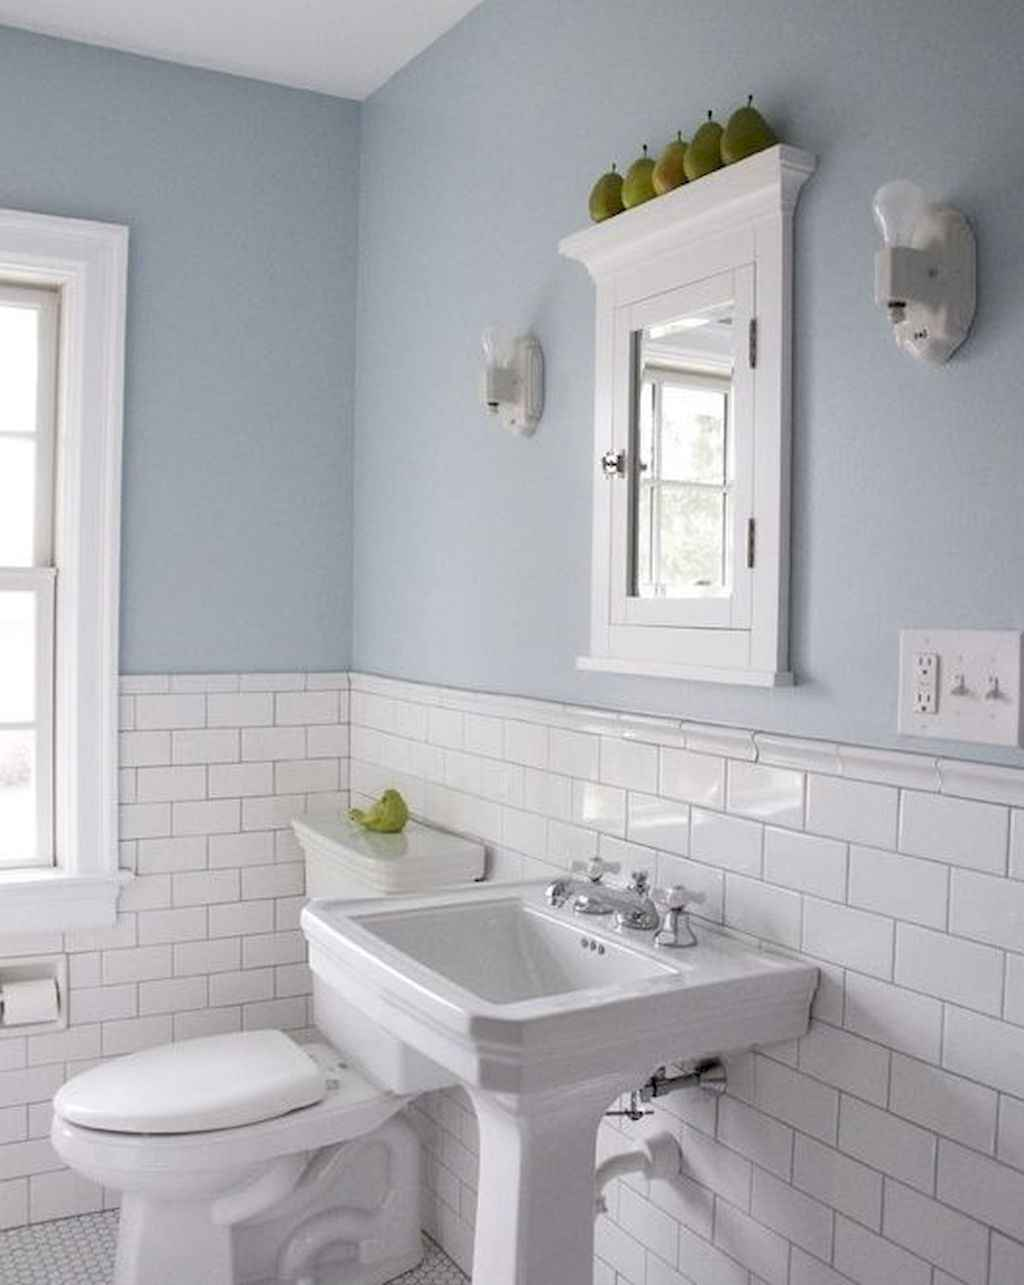 111 Brilliant Small Bathroom Remodel Ideas On A Budget (84)